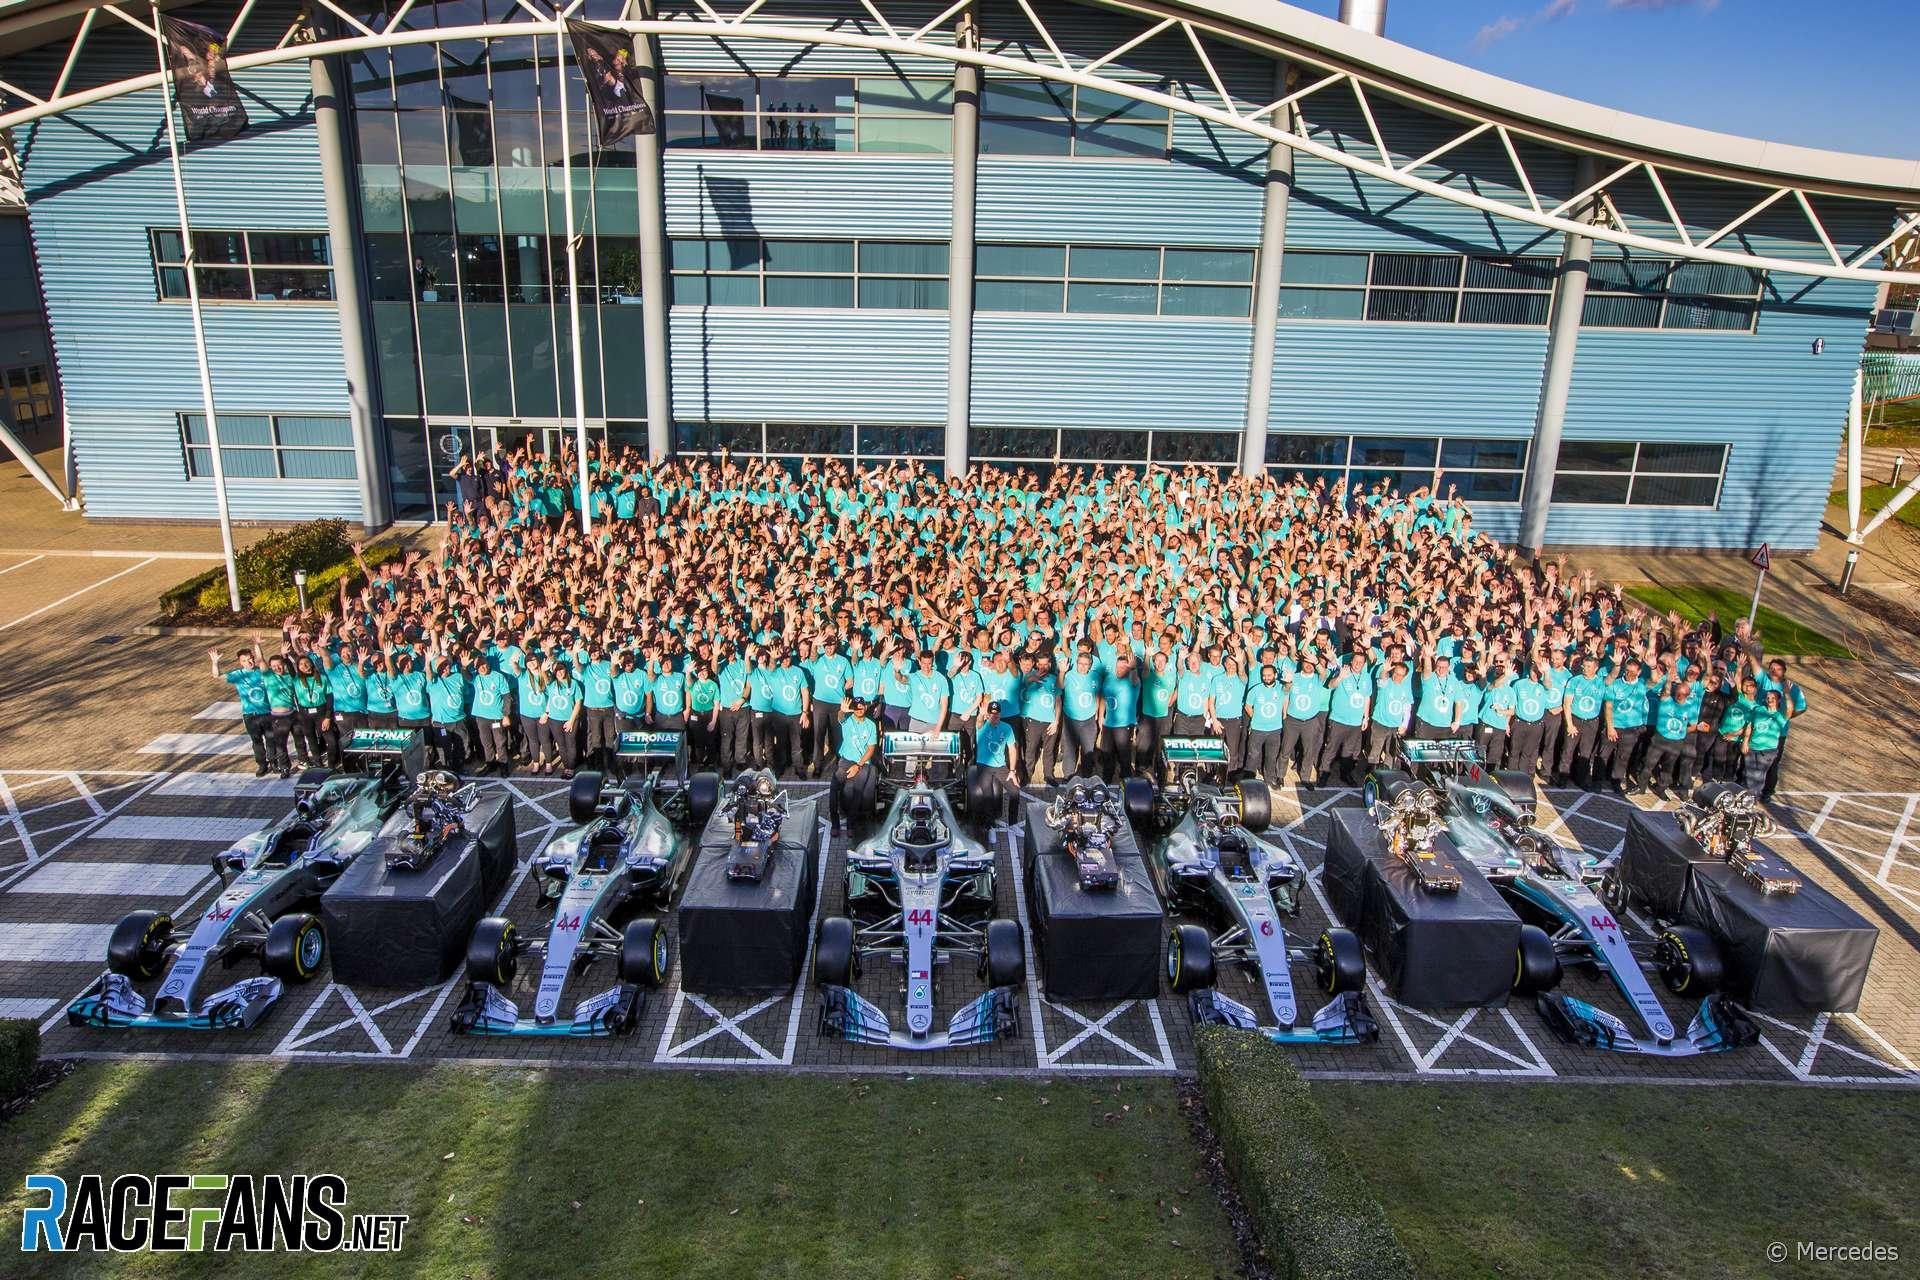 Mercedes 2018 championship celebrations